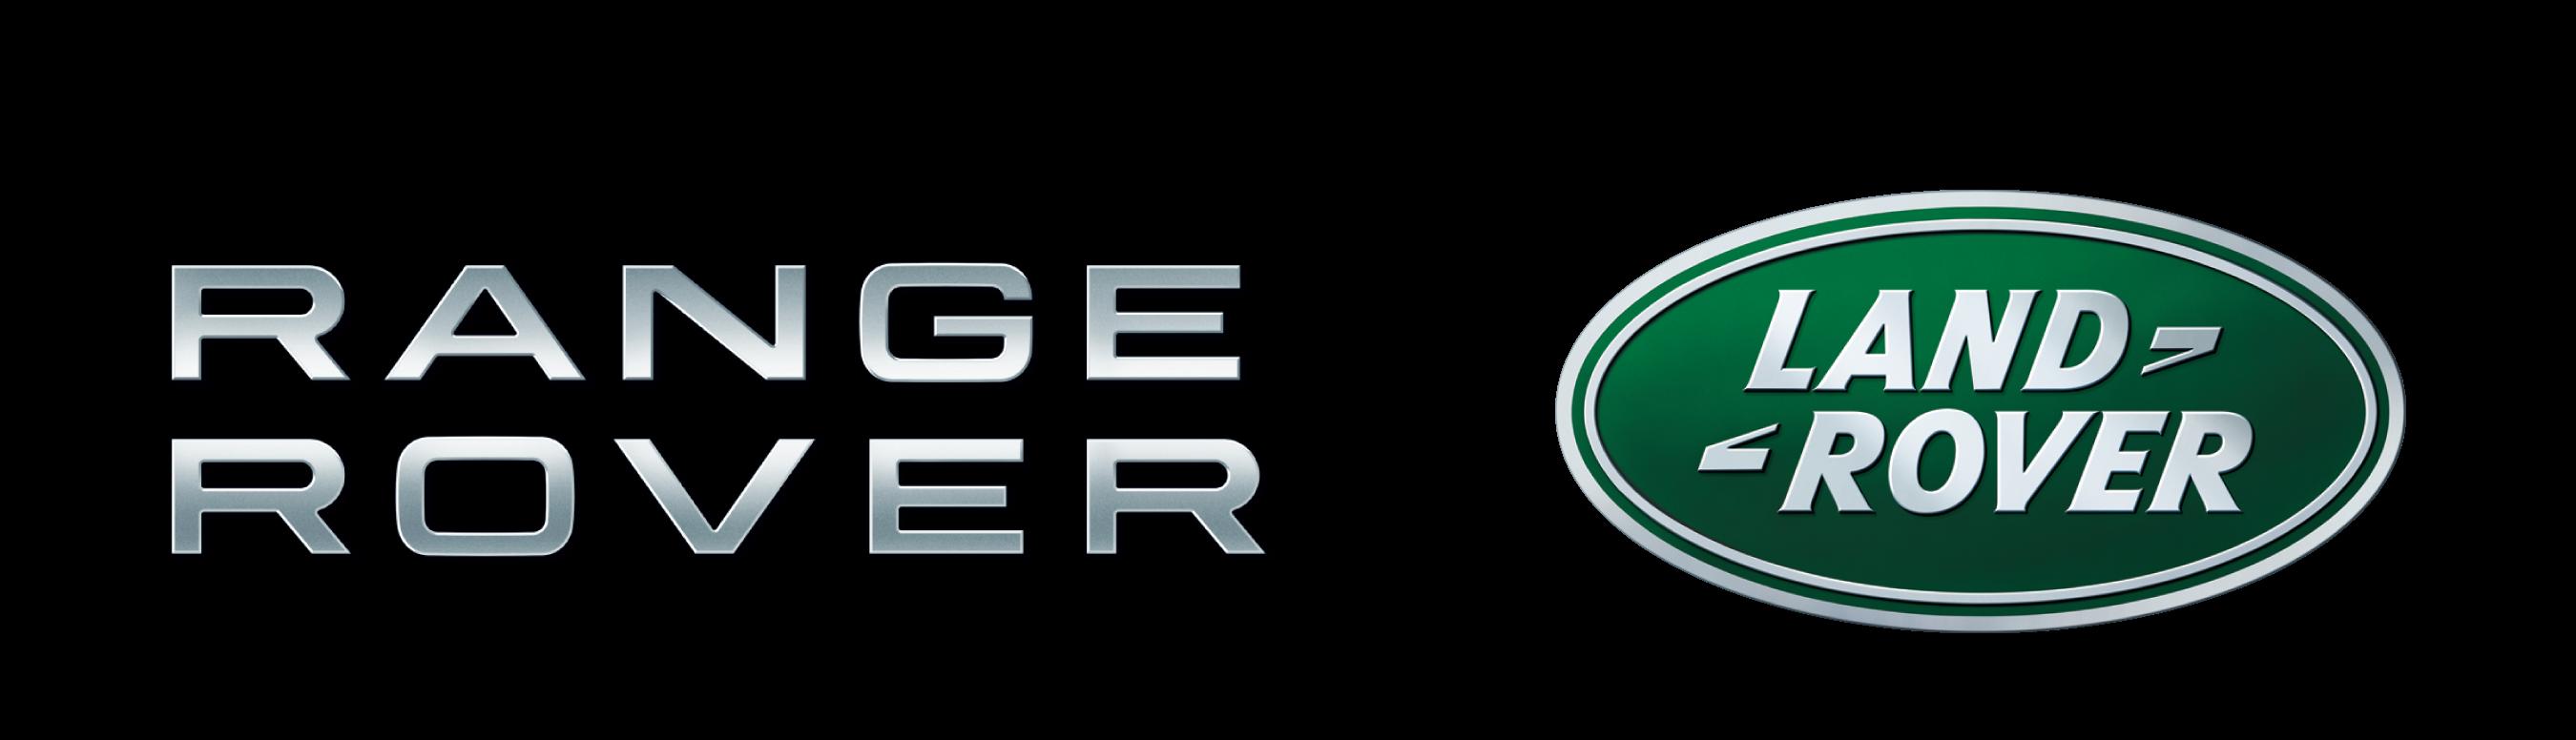 land-rover-logo-png-wallpaper-8.jpg